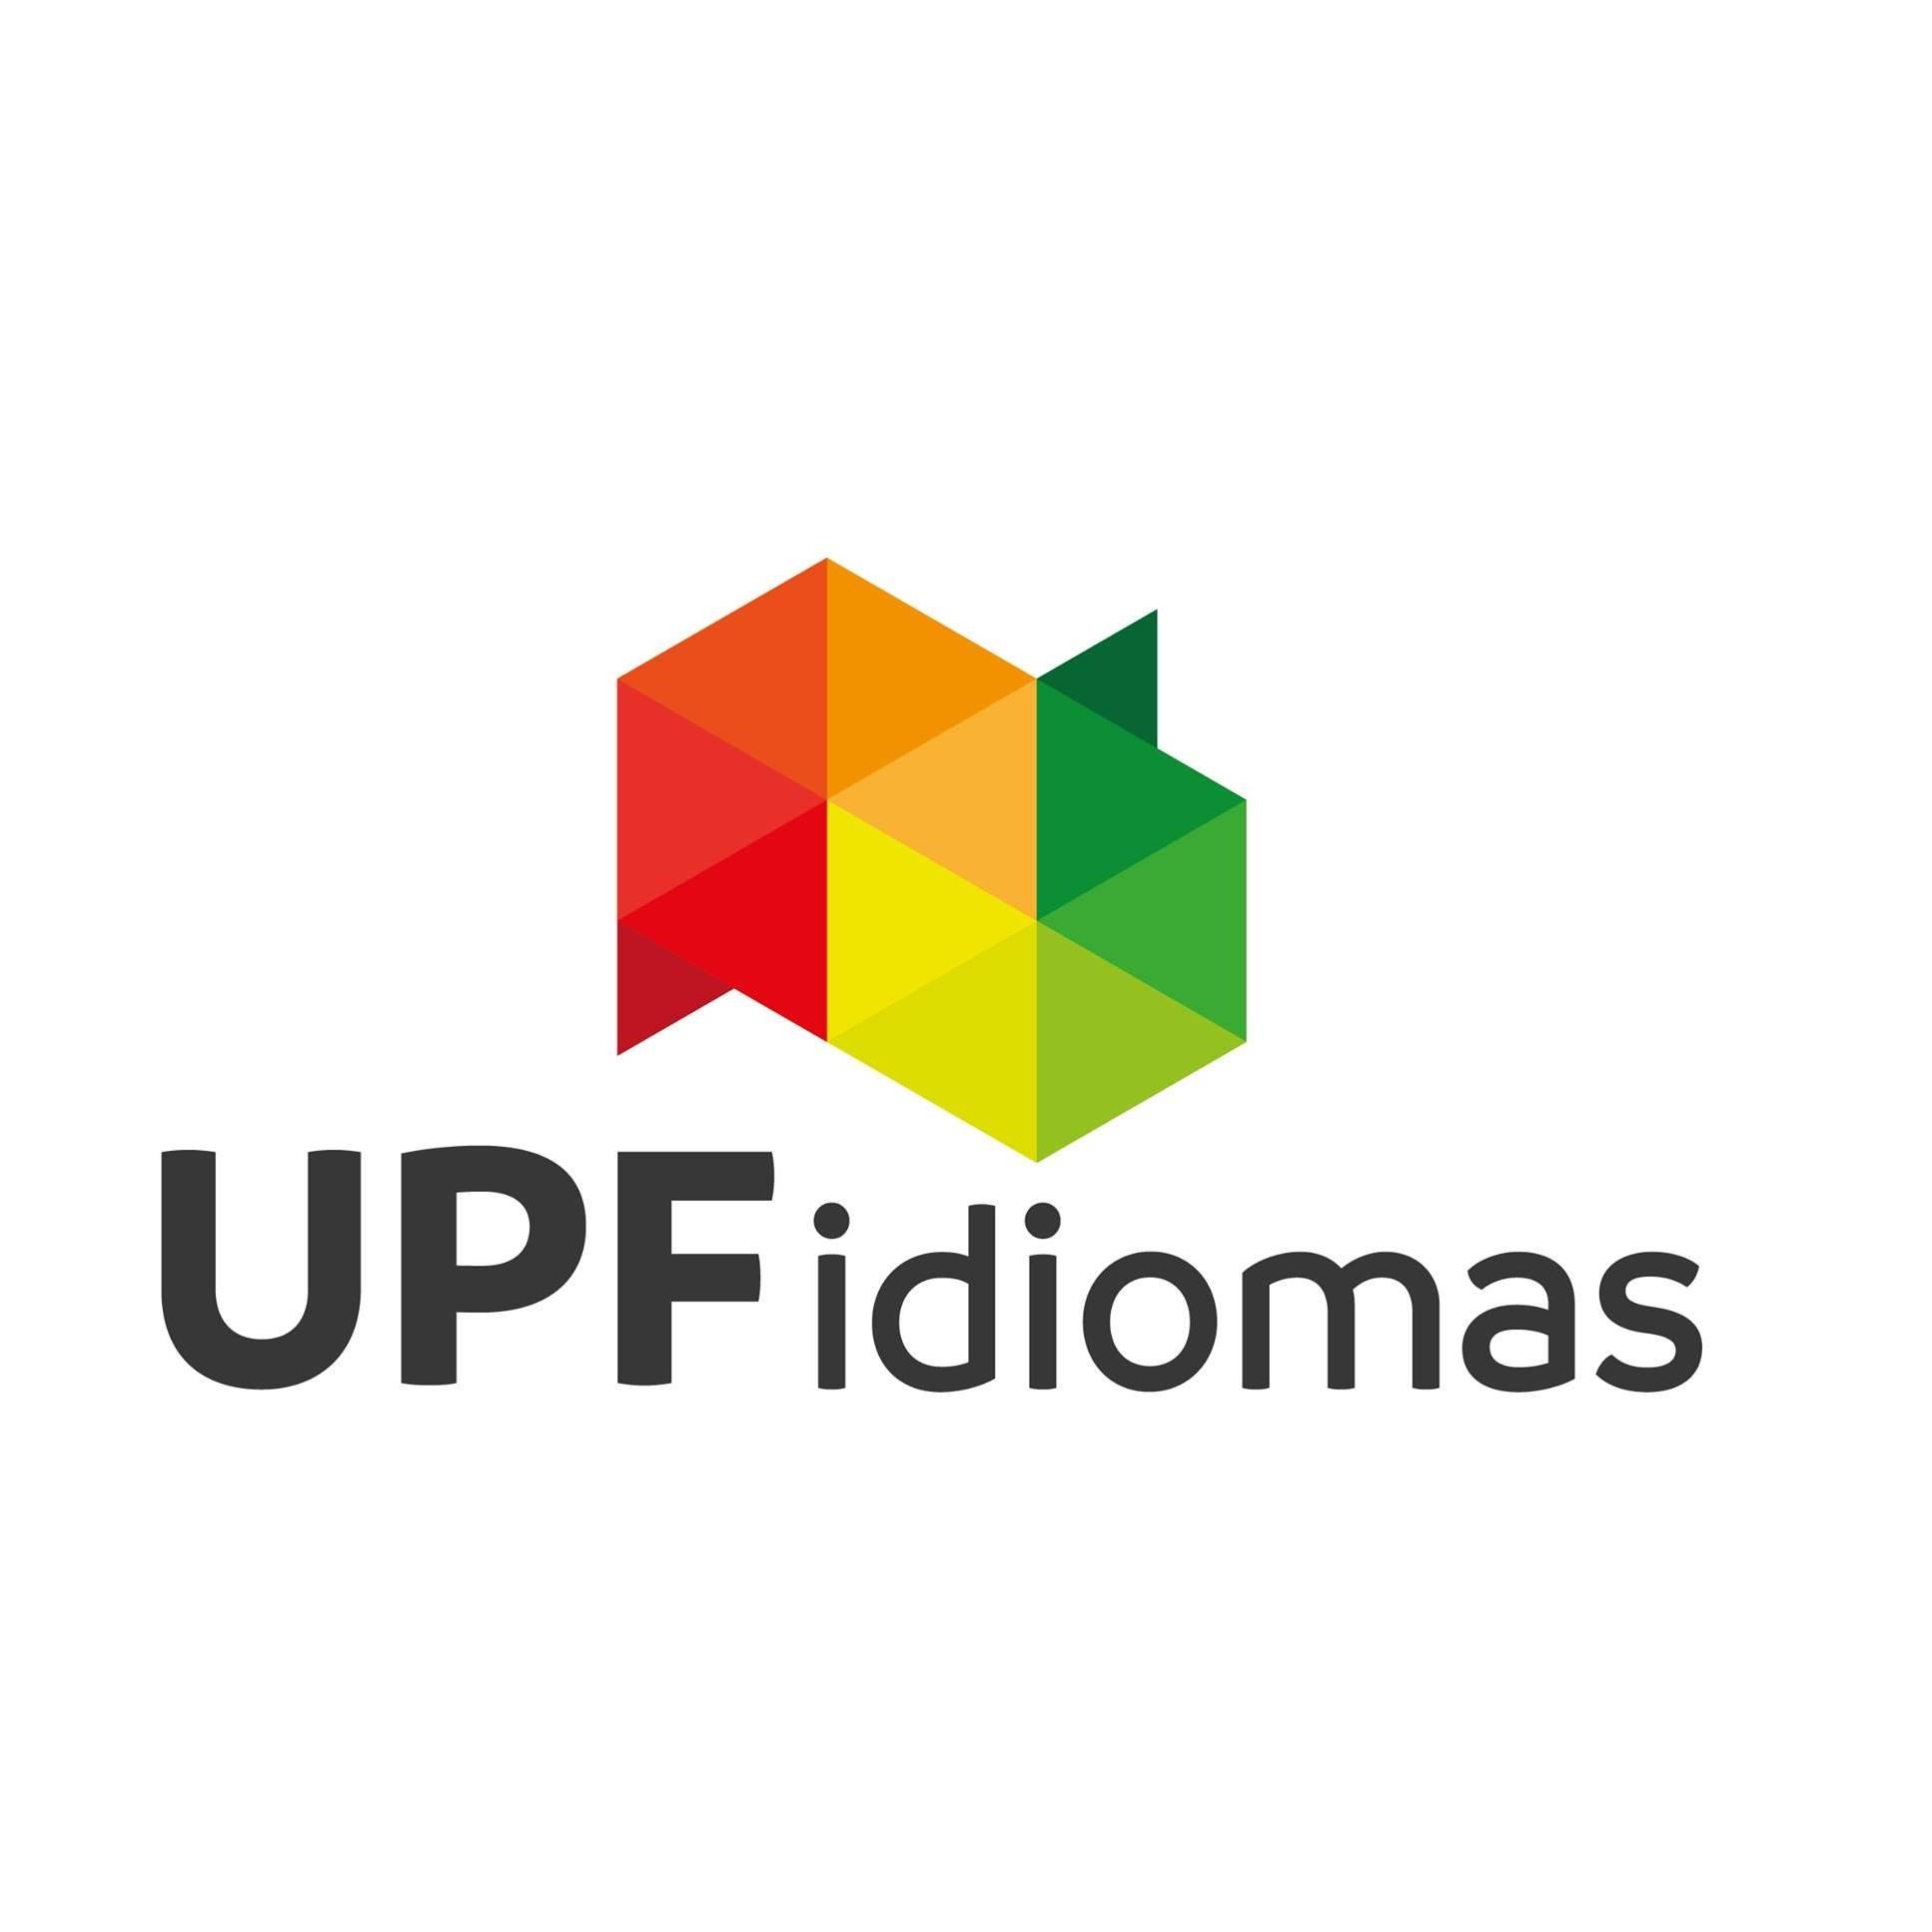 UPF - IDIOMAS